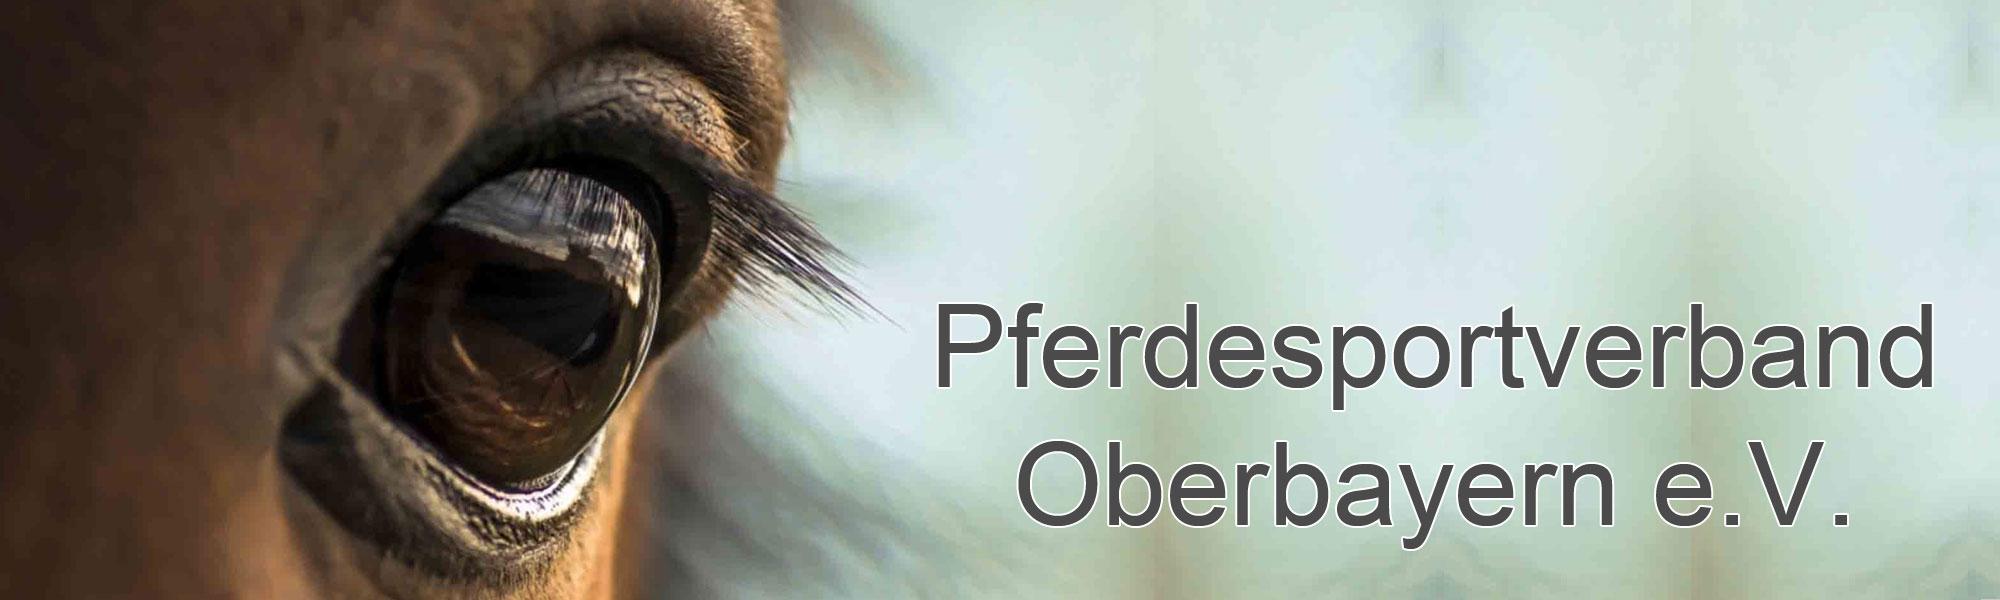 Pferdesportverband Oberbayern